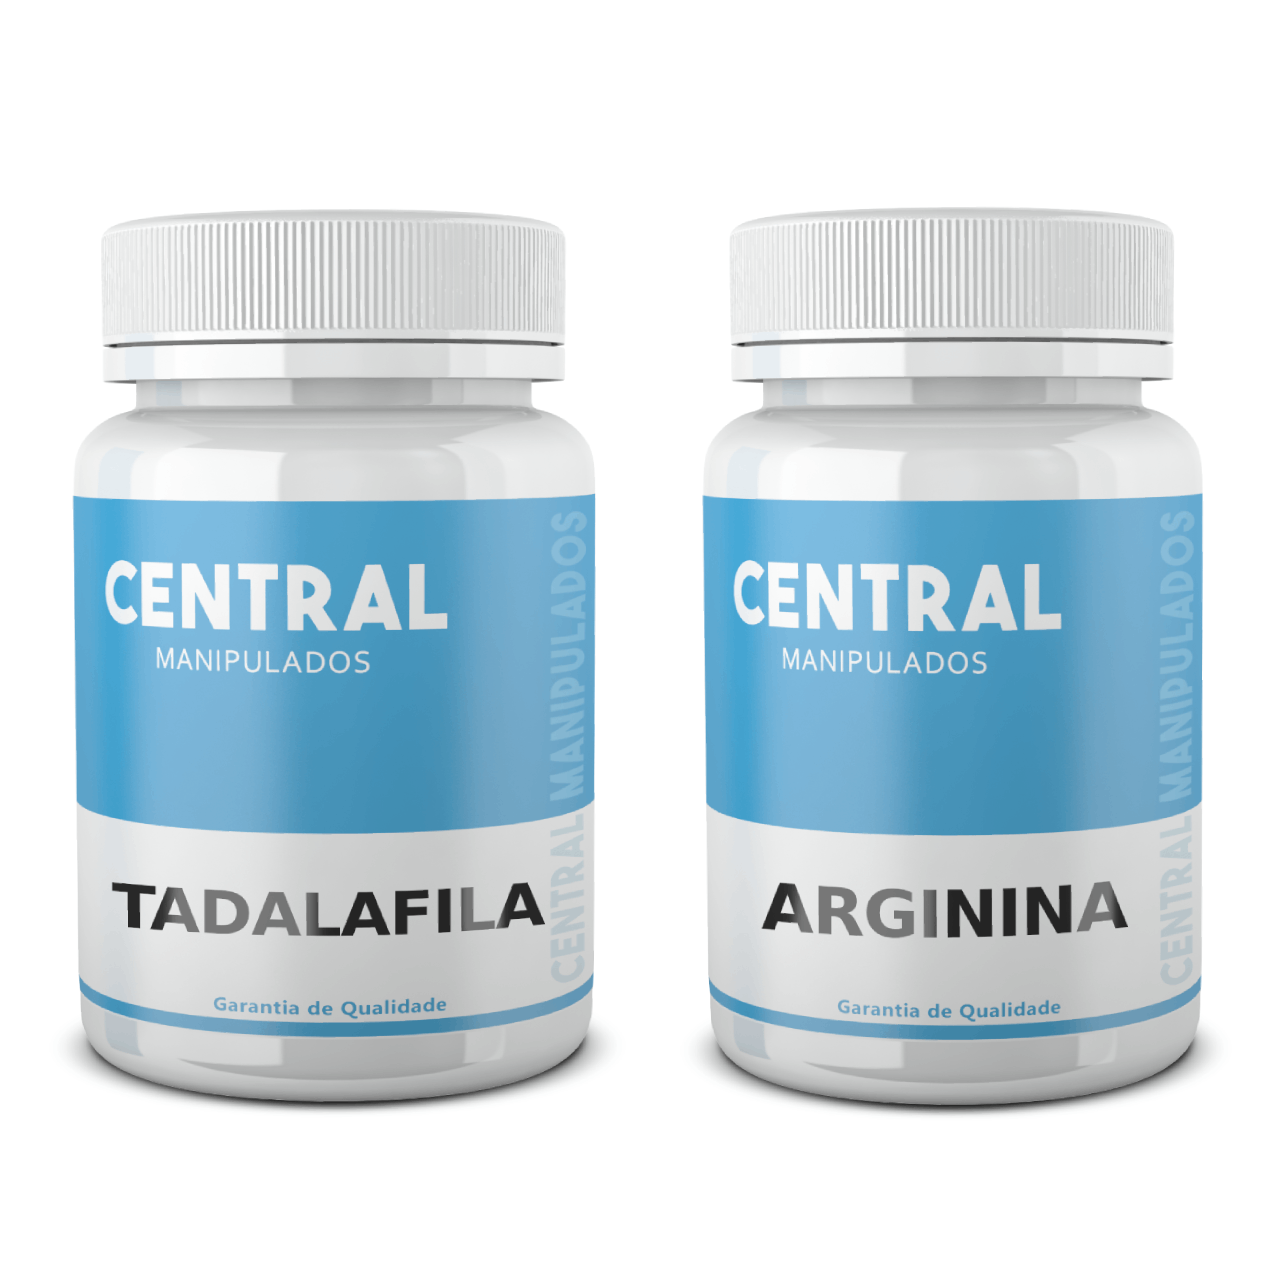 Tadalafila 10mg 120 Cápsulas + Arginina 500mg 120 Cápsulas - Vasodilatador